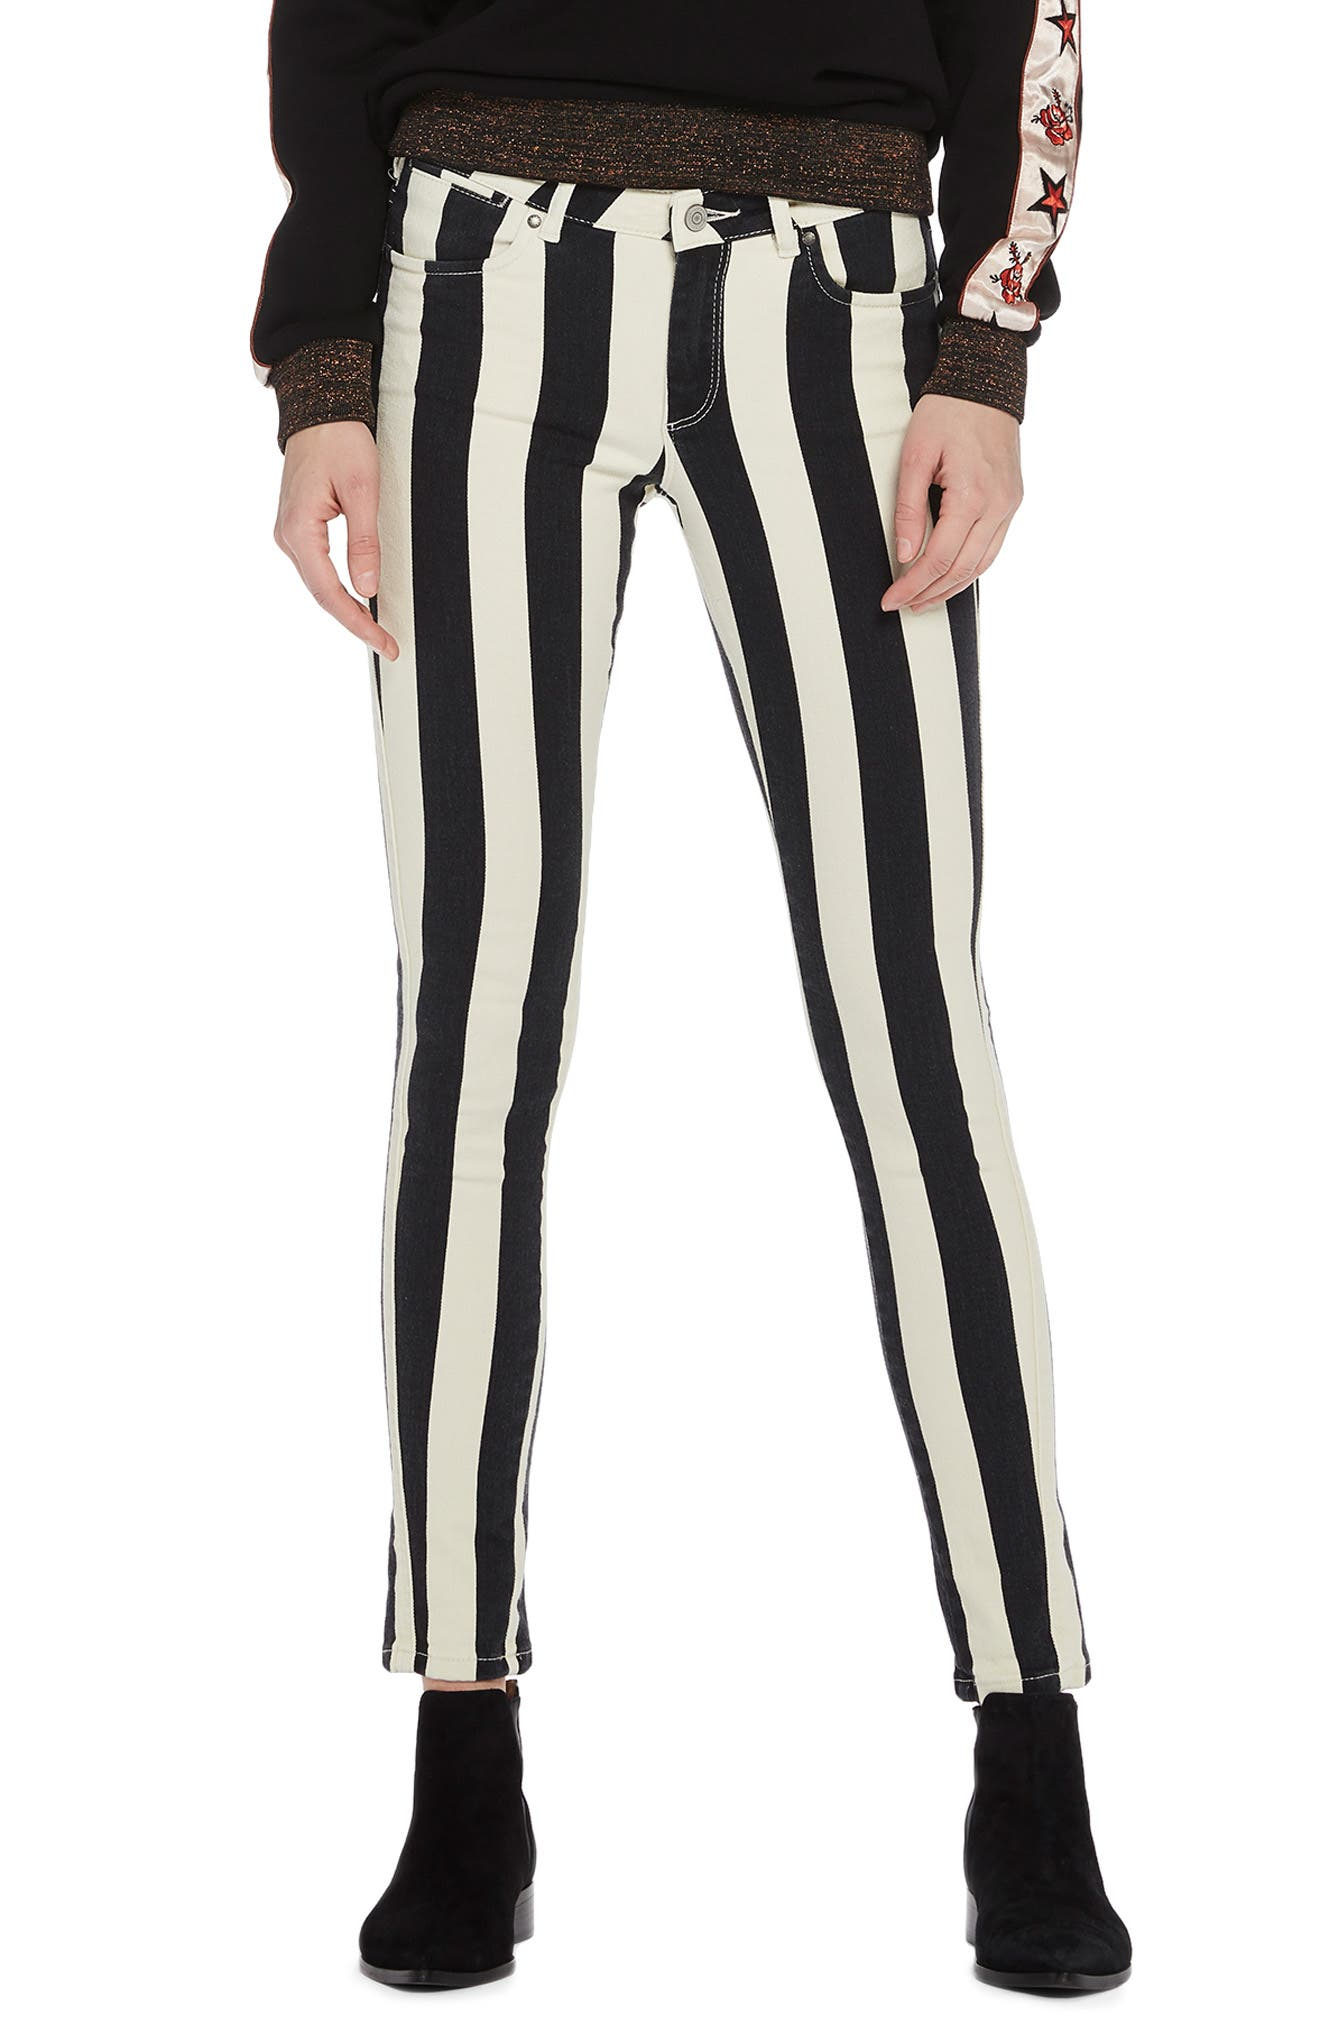 La Bohemienne Skinny Fit Pants,                             Main thumbnail 1, color,                             400